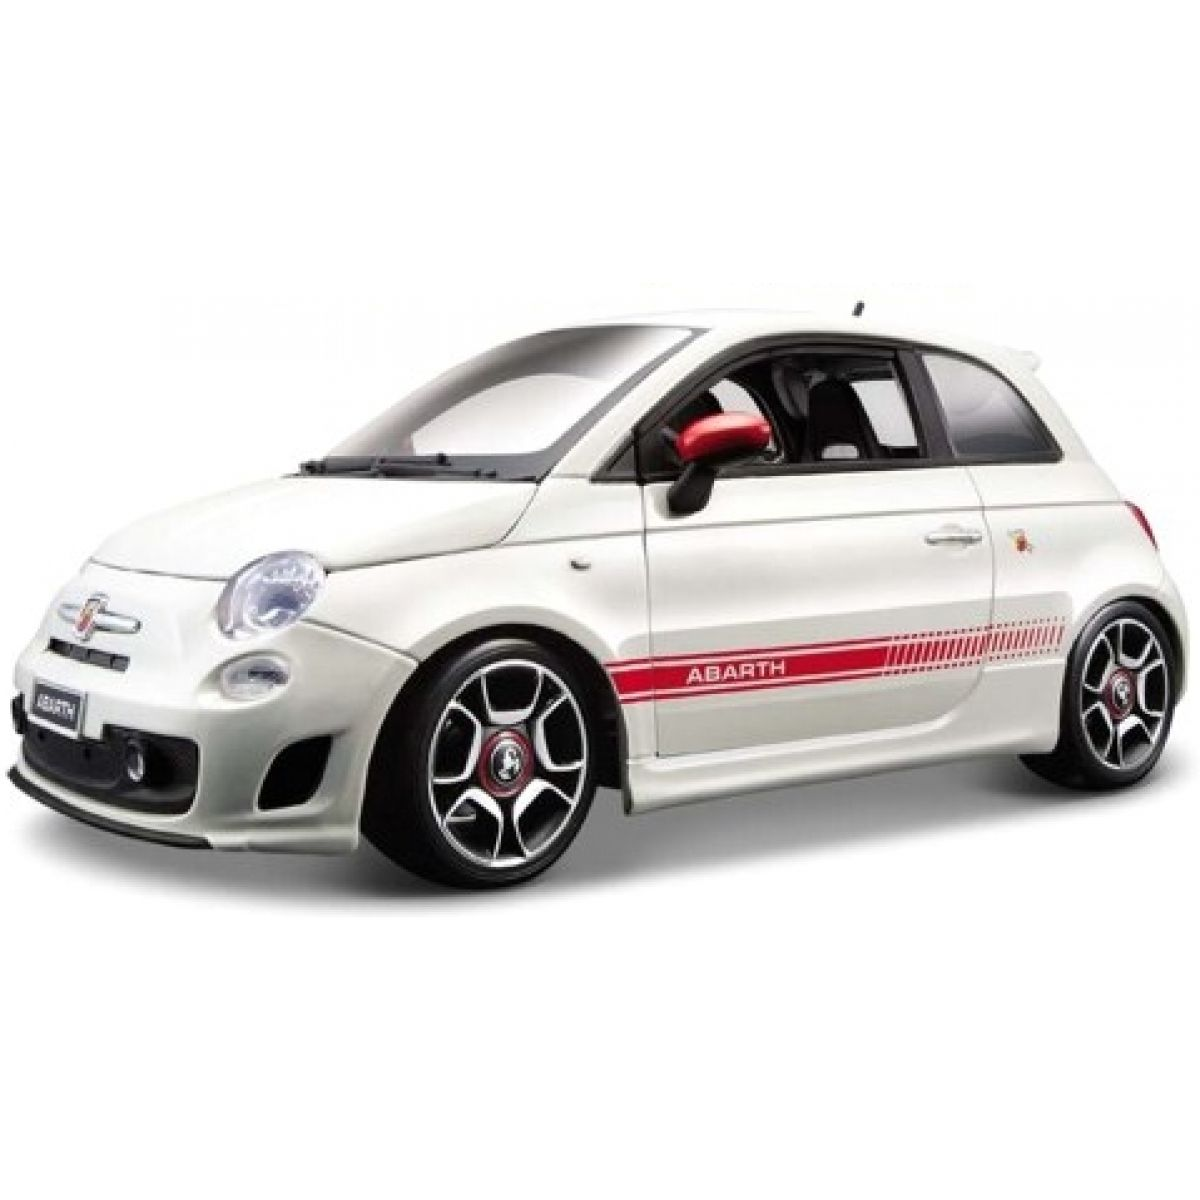 Fiat 500 Abarth Bburago 1:18